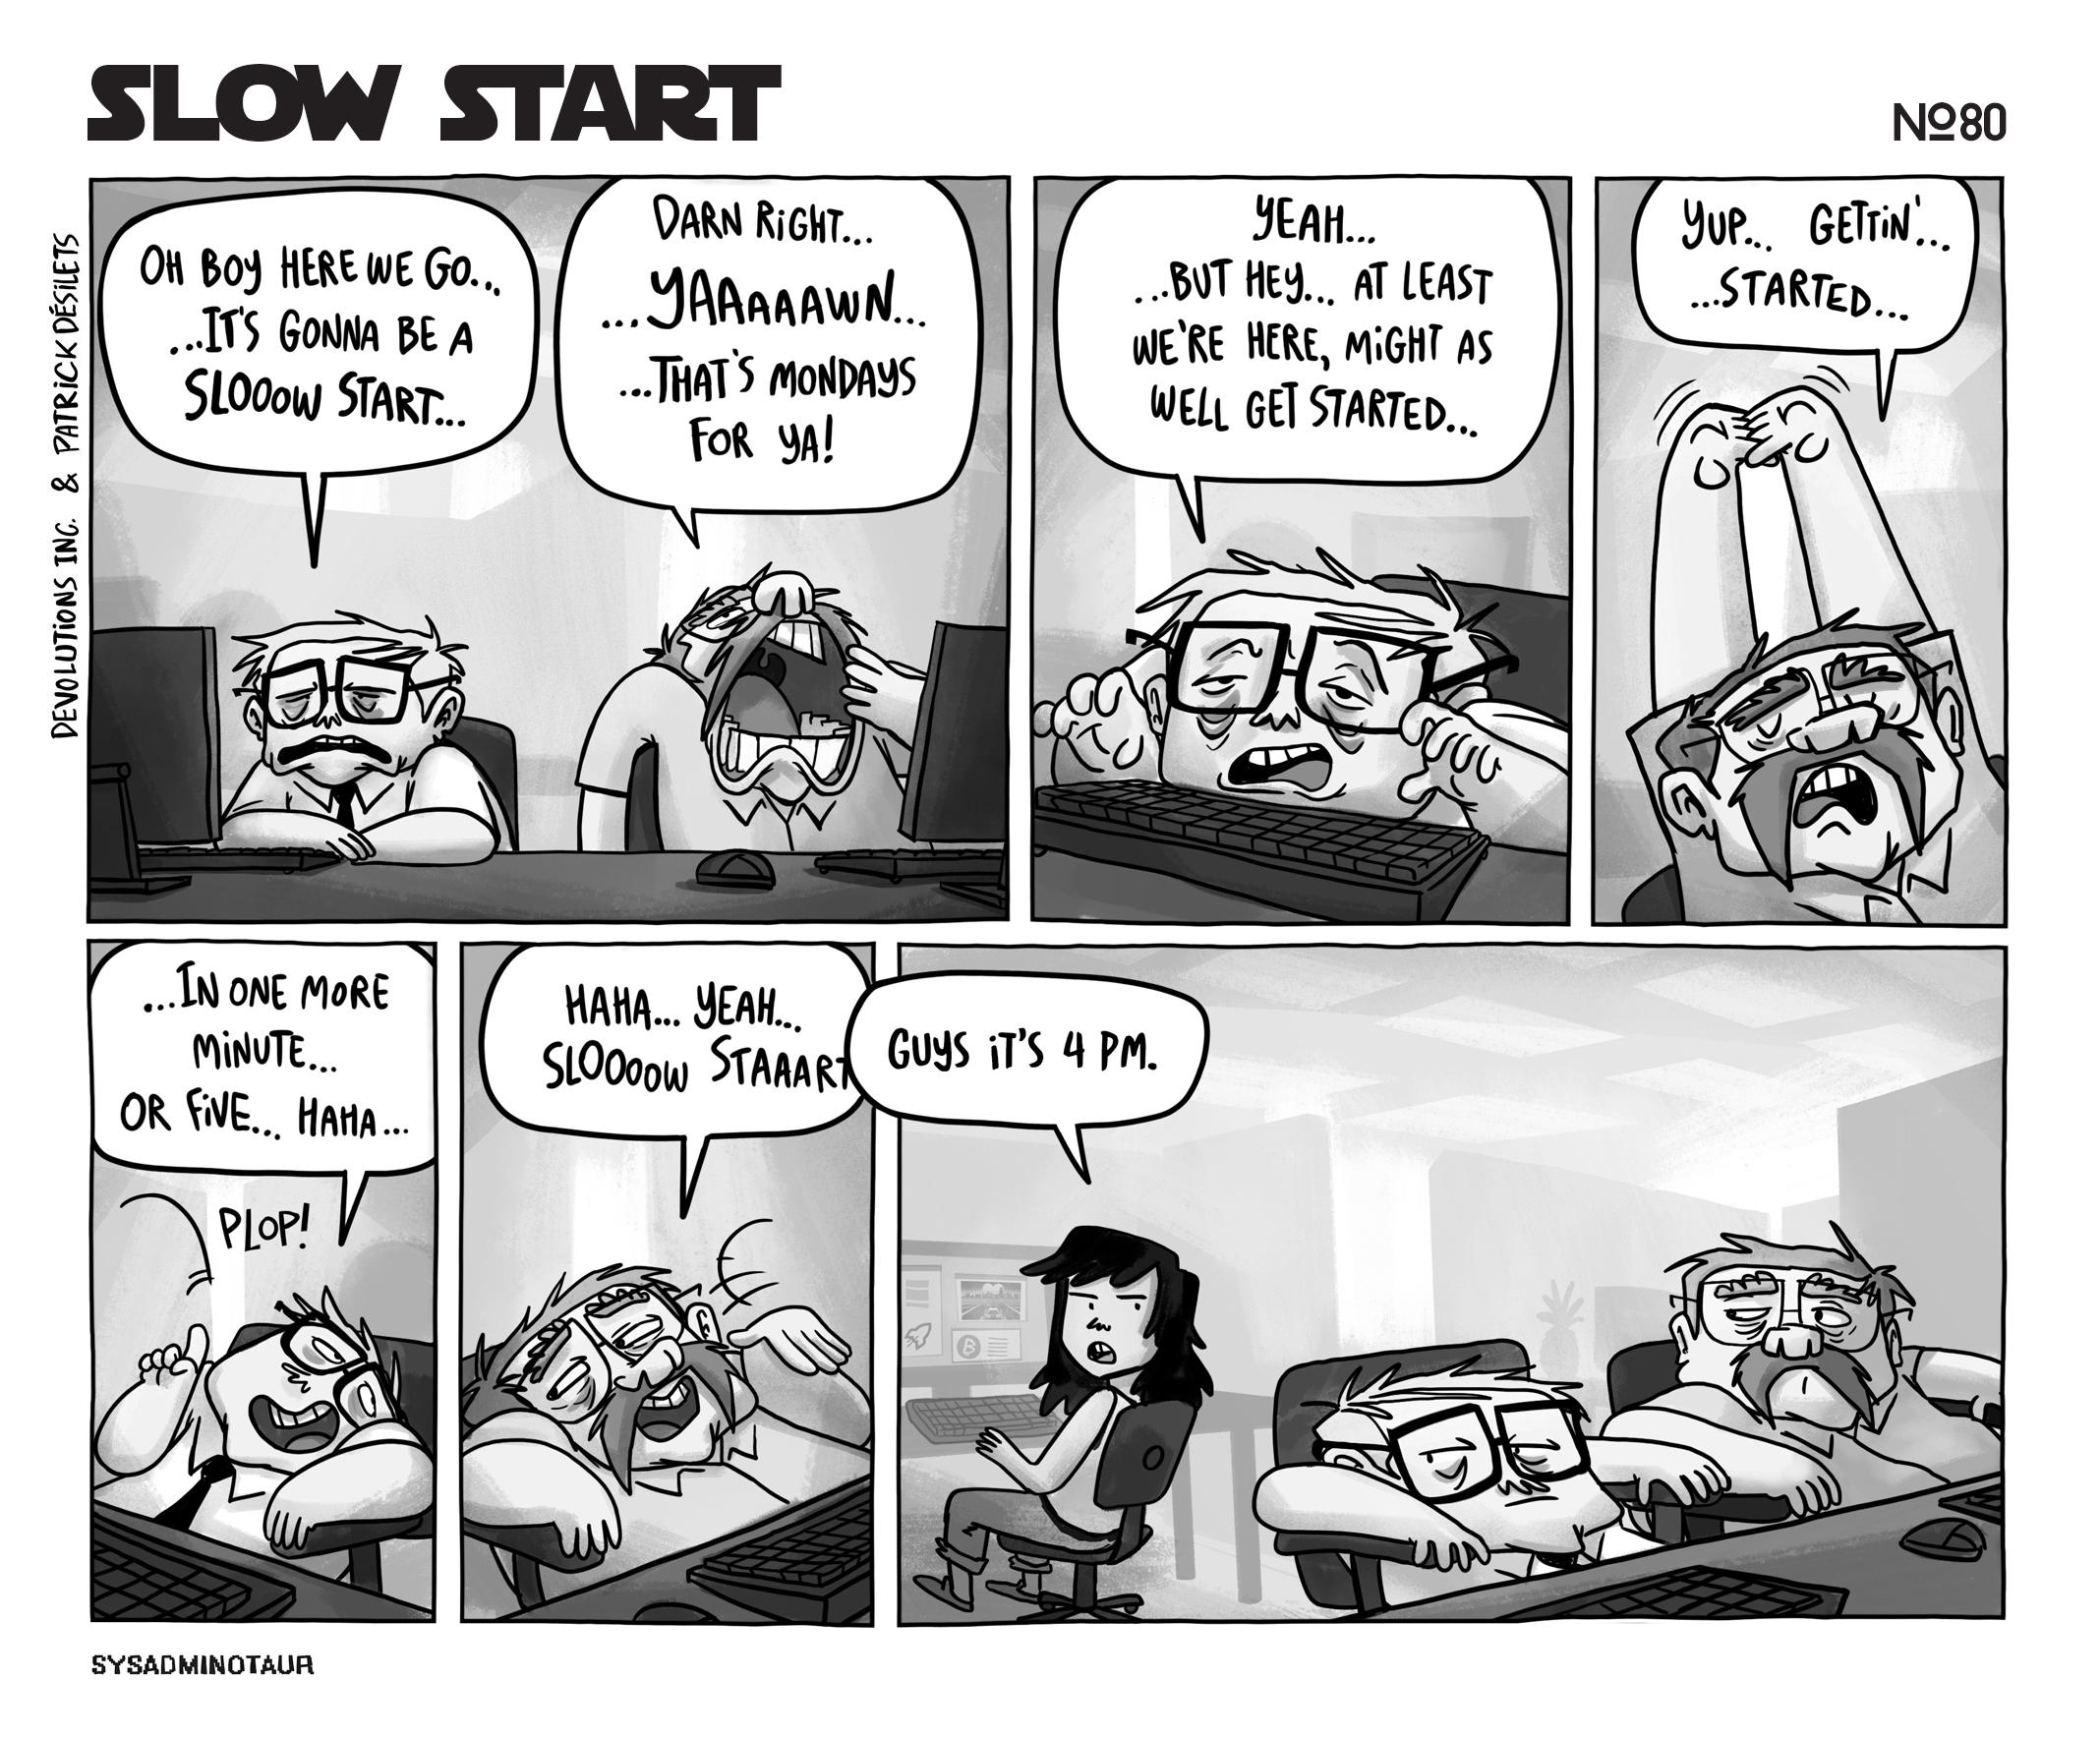 sysadminotaur 080 slow start